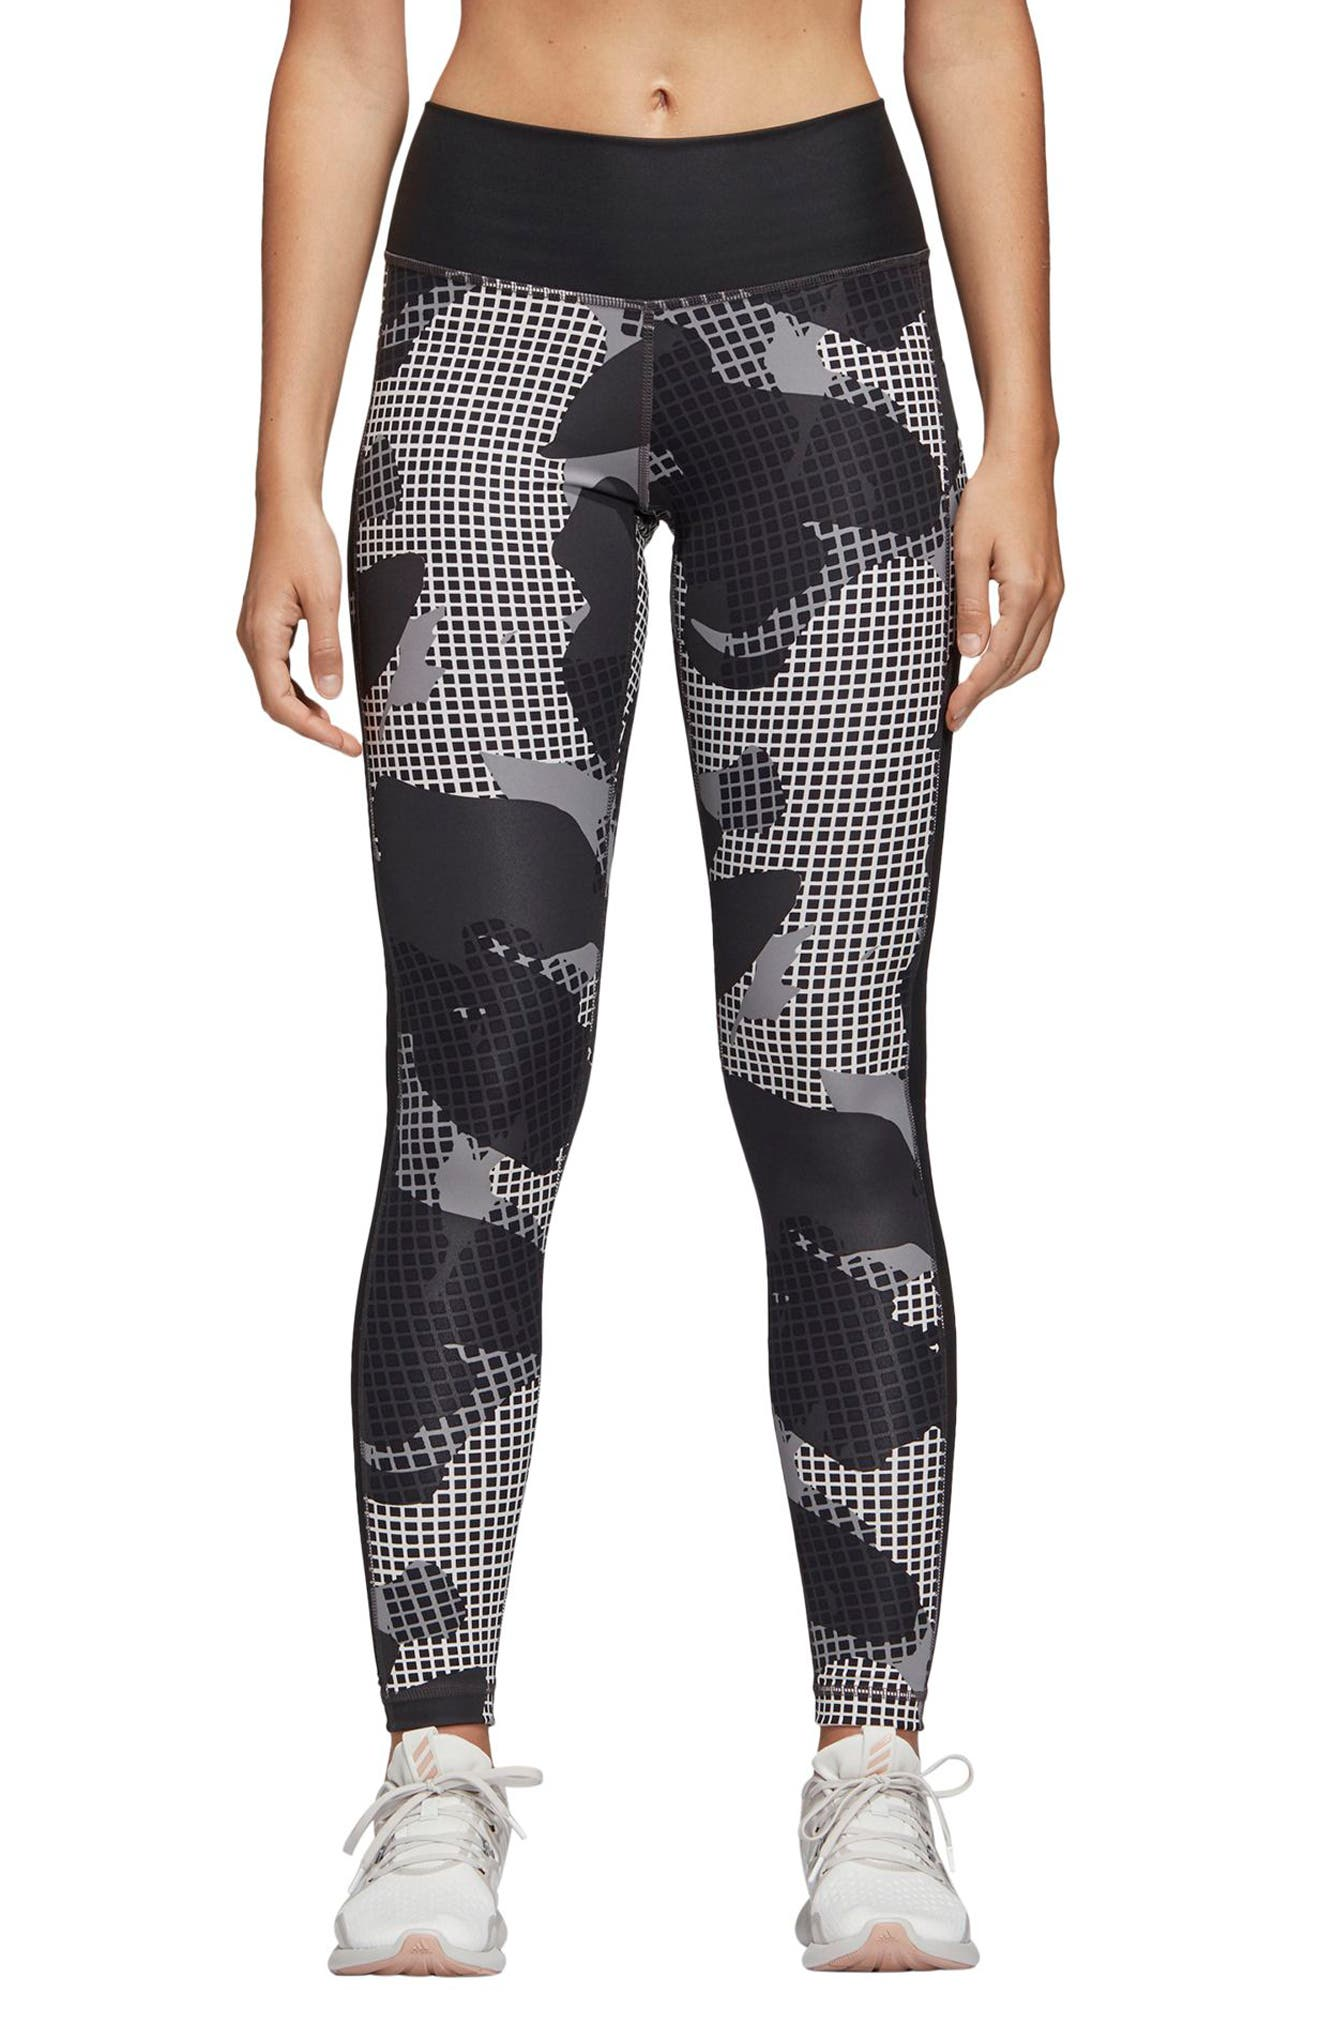 Heatracer Leggings,                         Main,                         color, BLACK/ PRINT